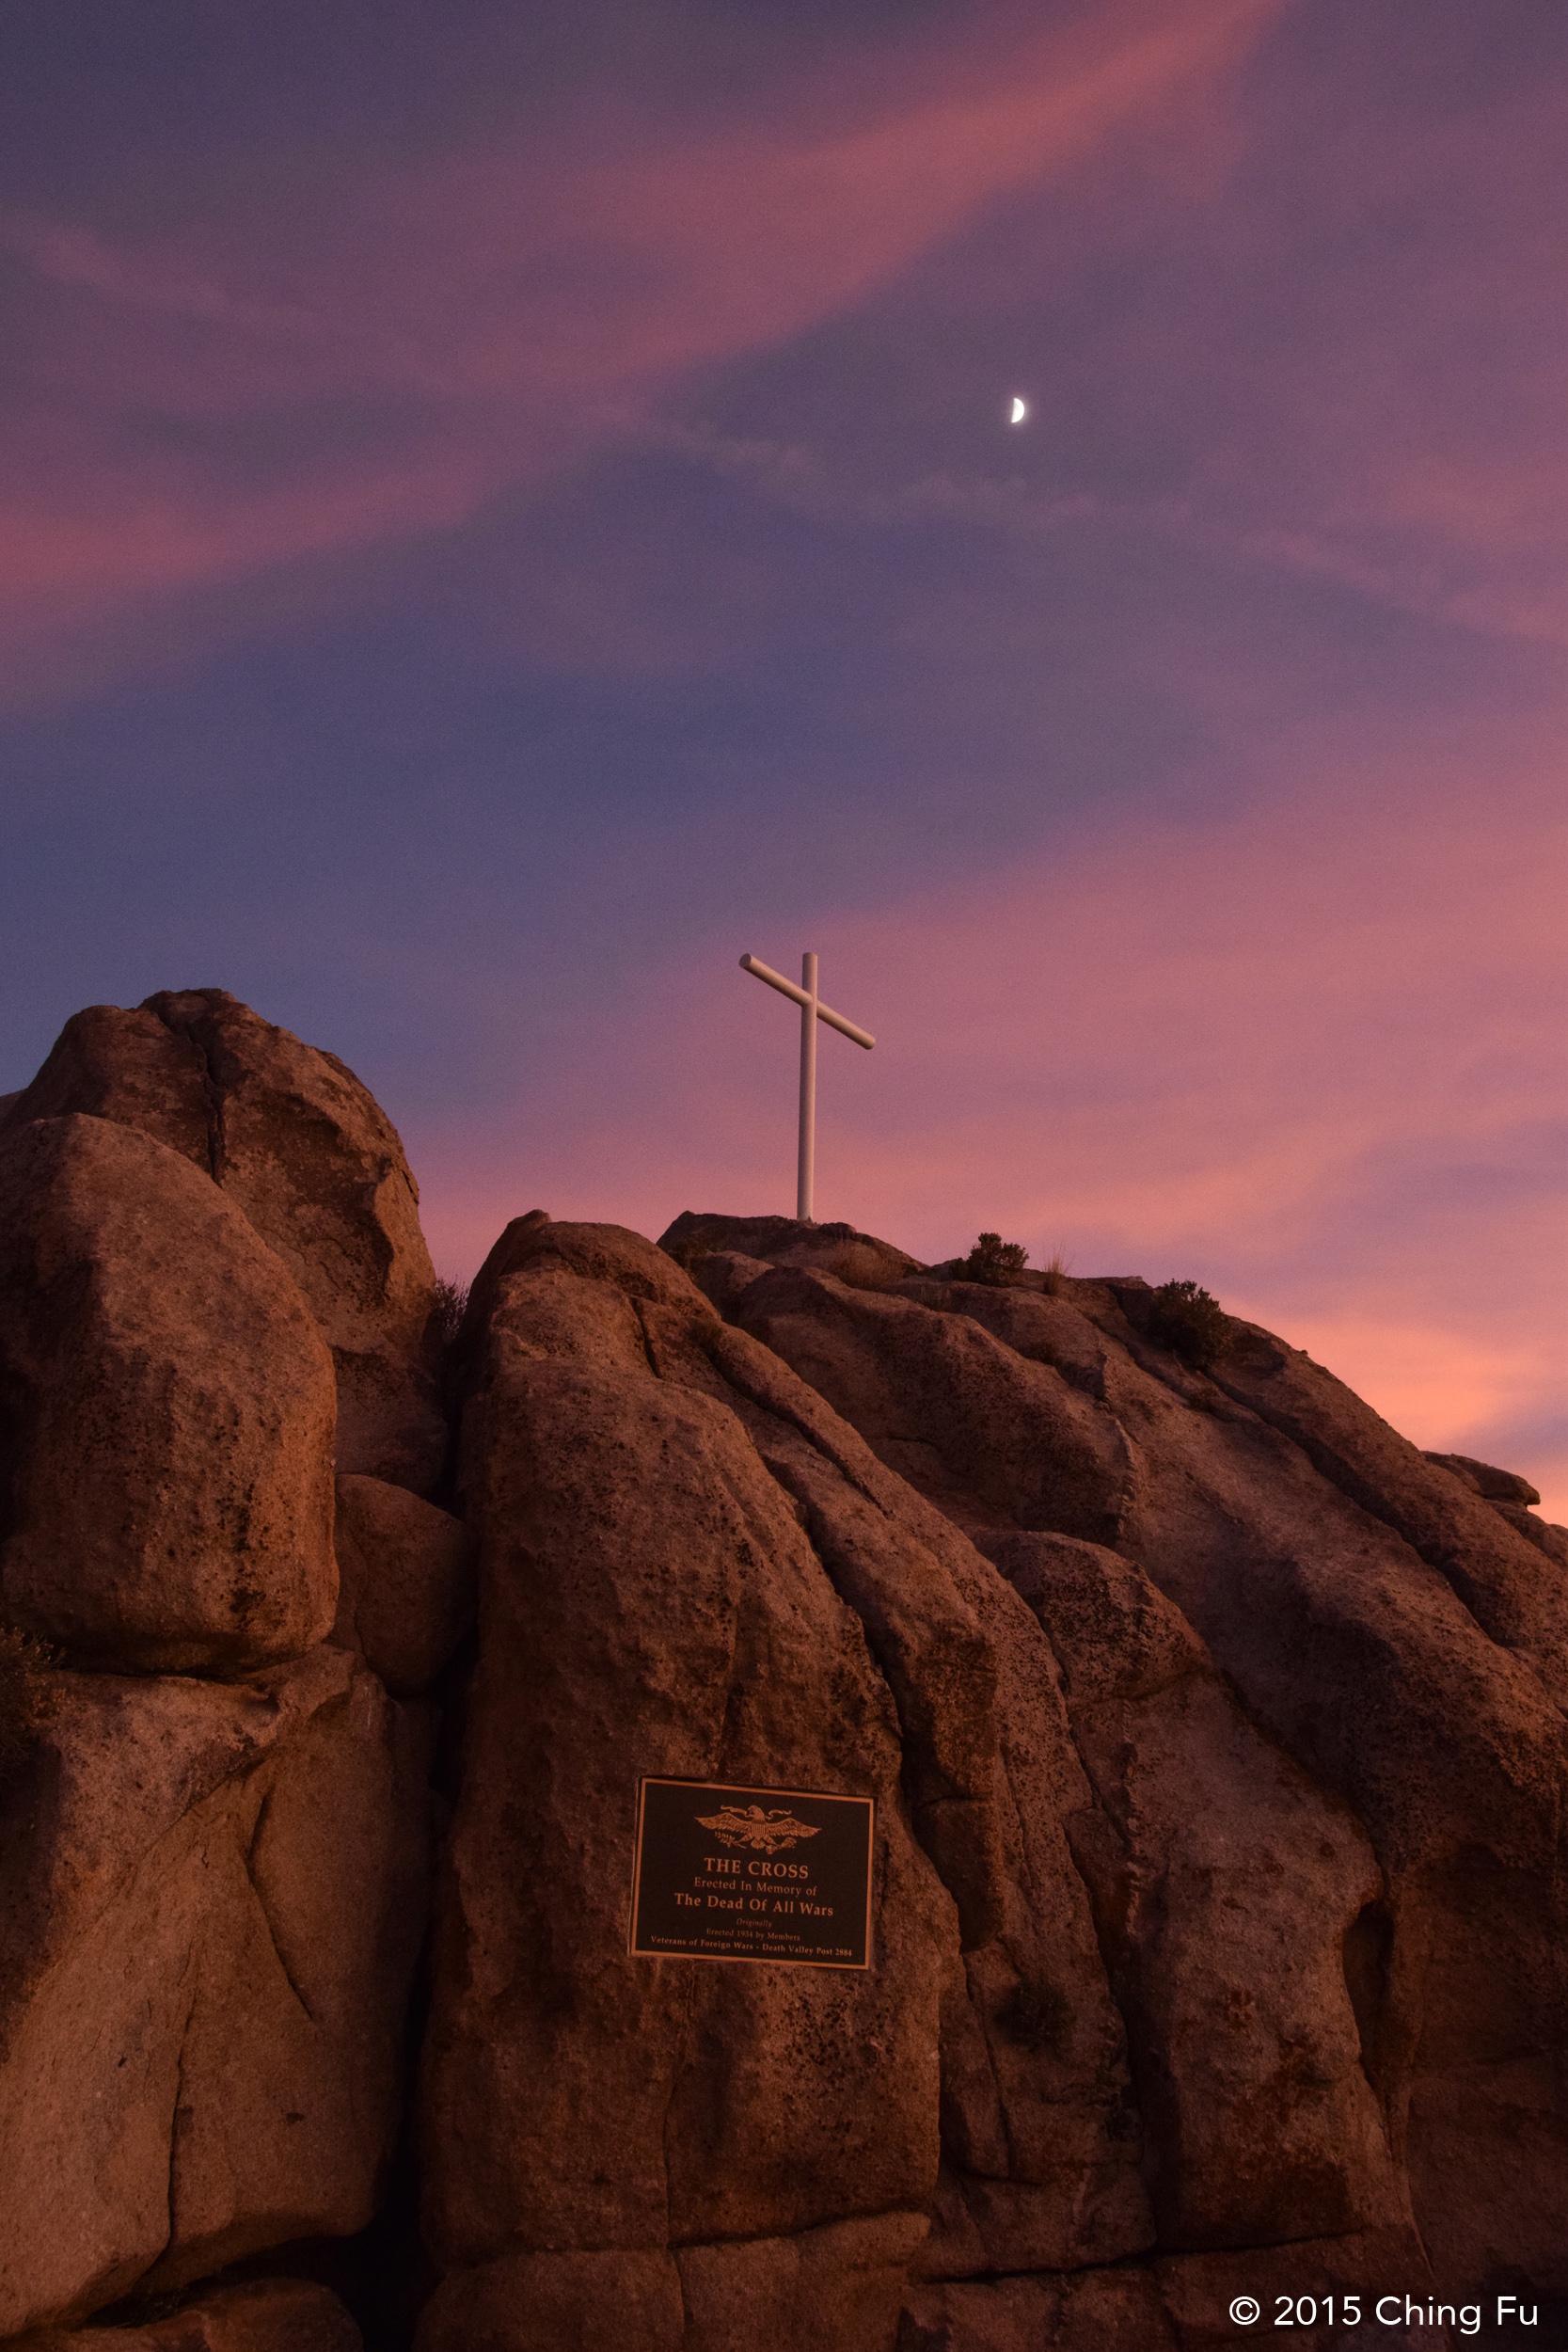 We boondocked behind Sunrise Rock aka Mojave Cross. The original cross was erected in 1934 in honor of those who died in war.